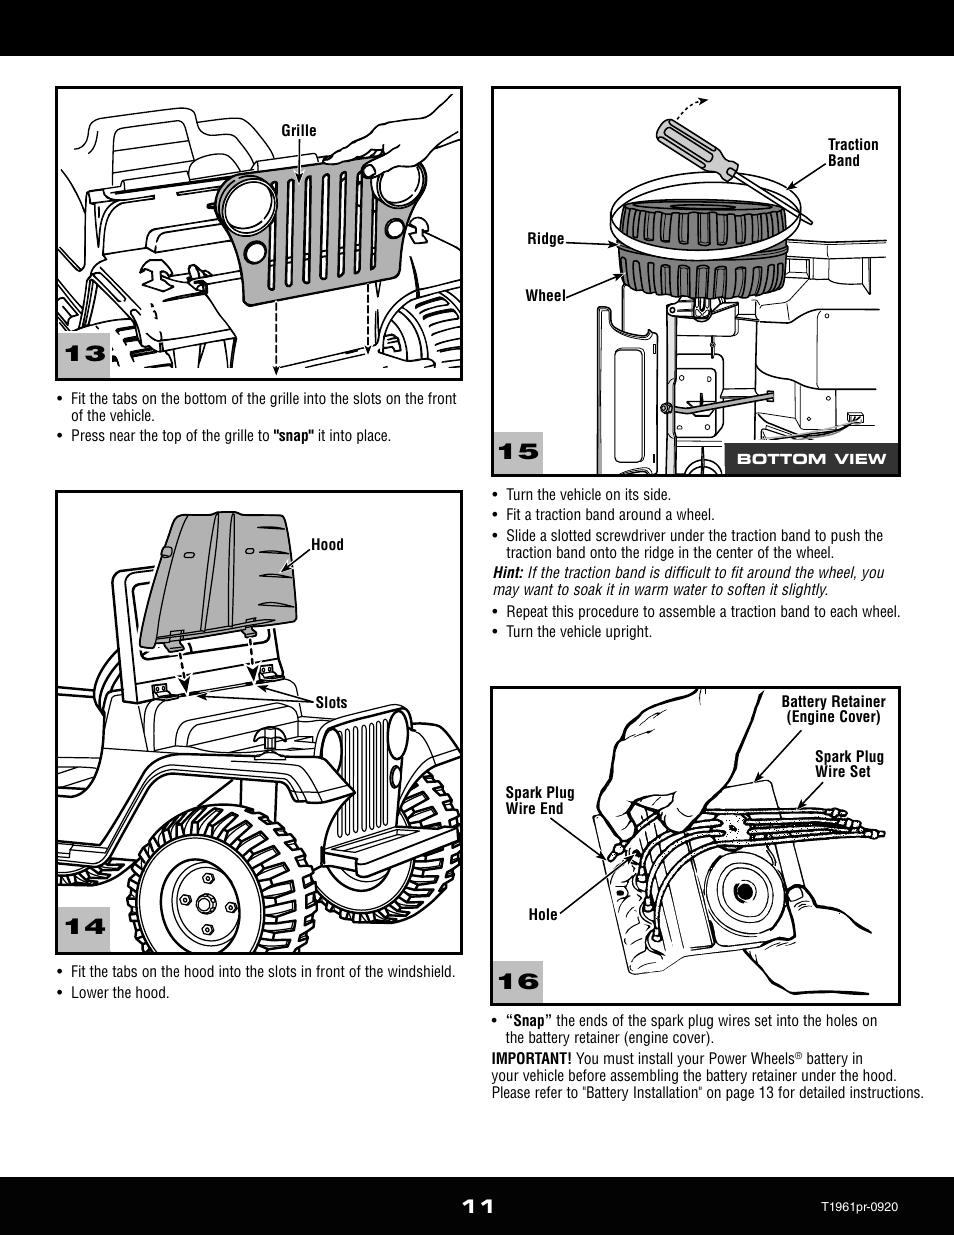 barbie jeep wrangler wiring diagram